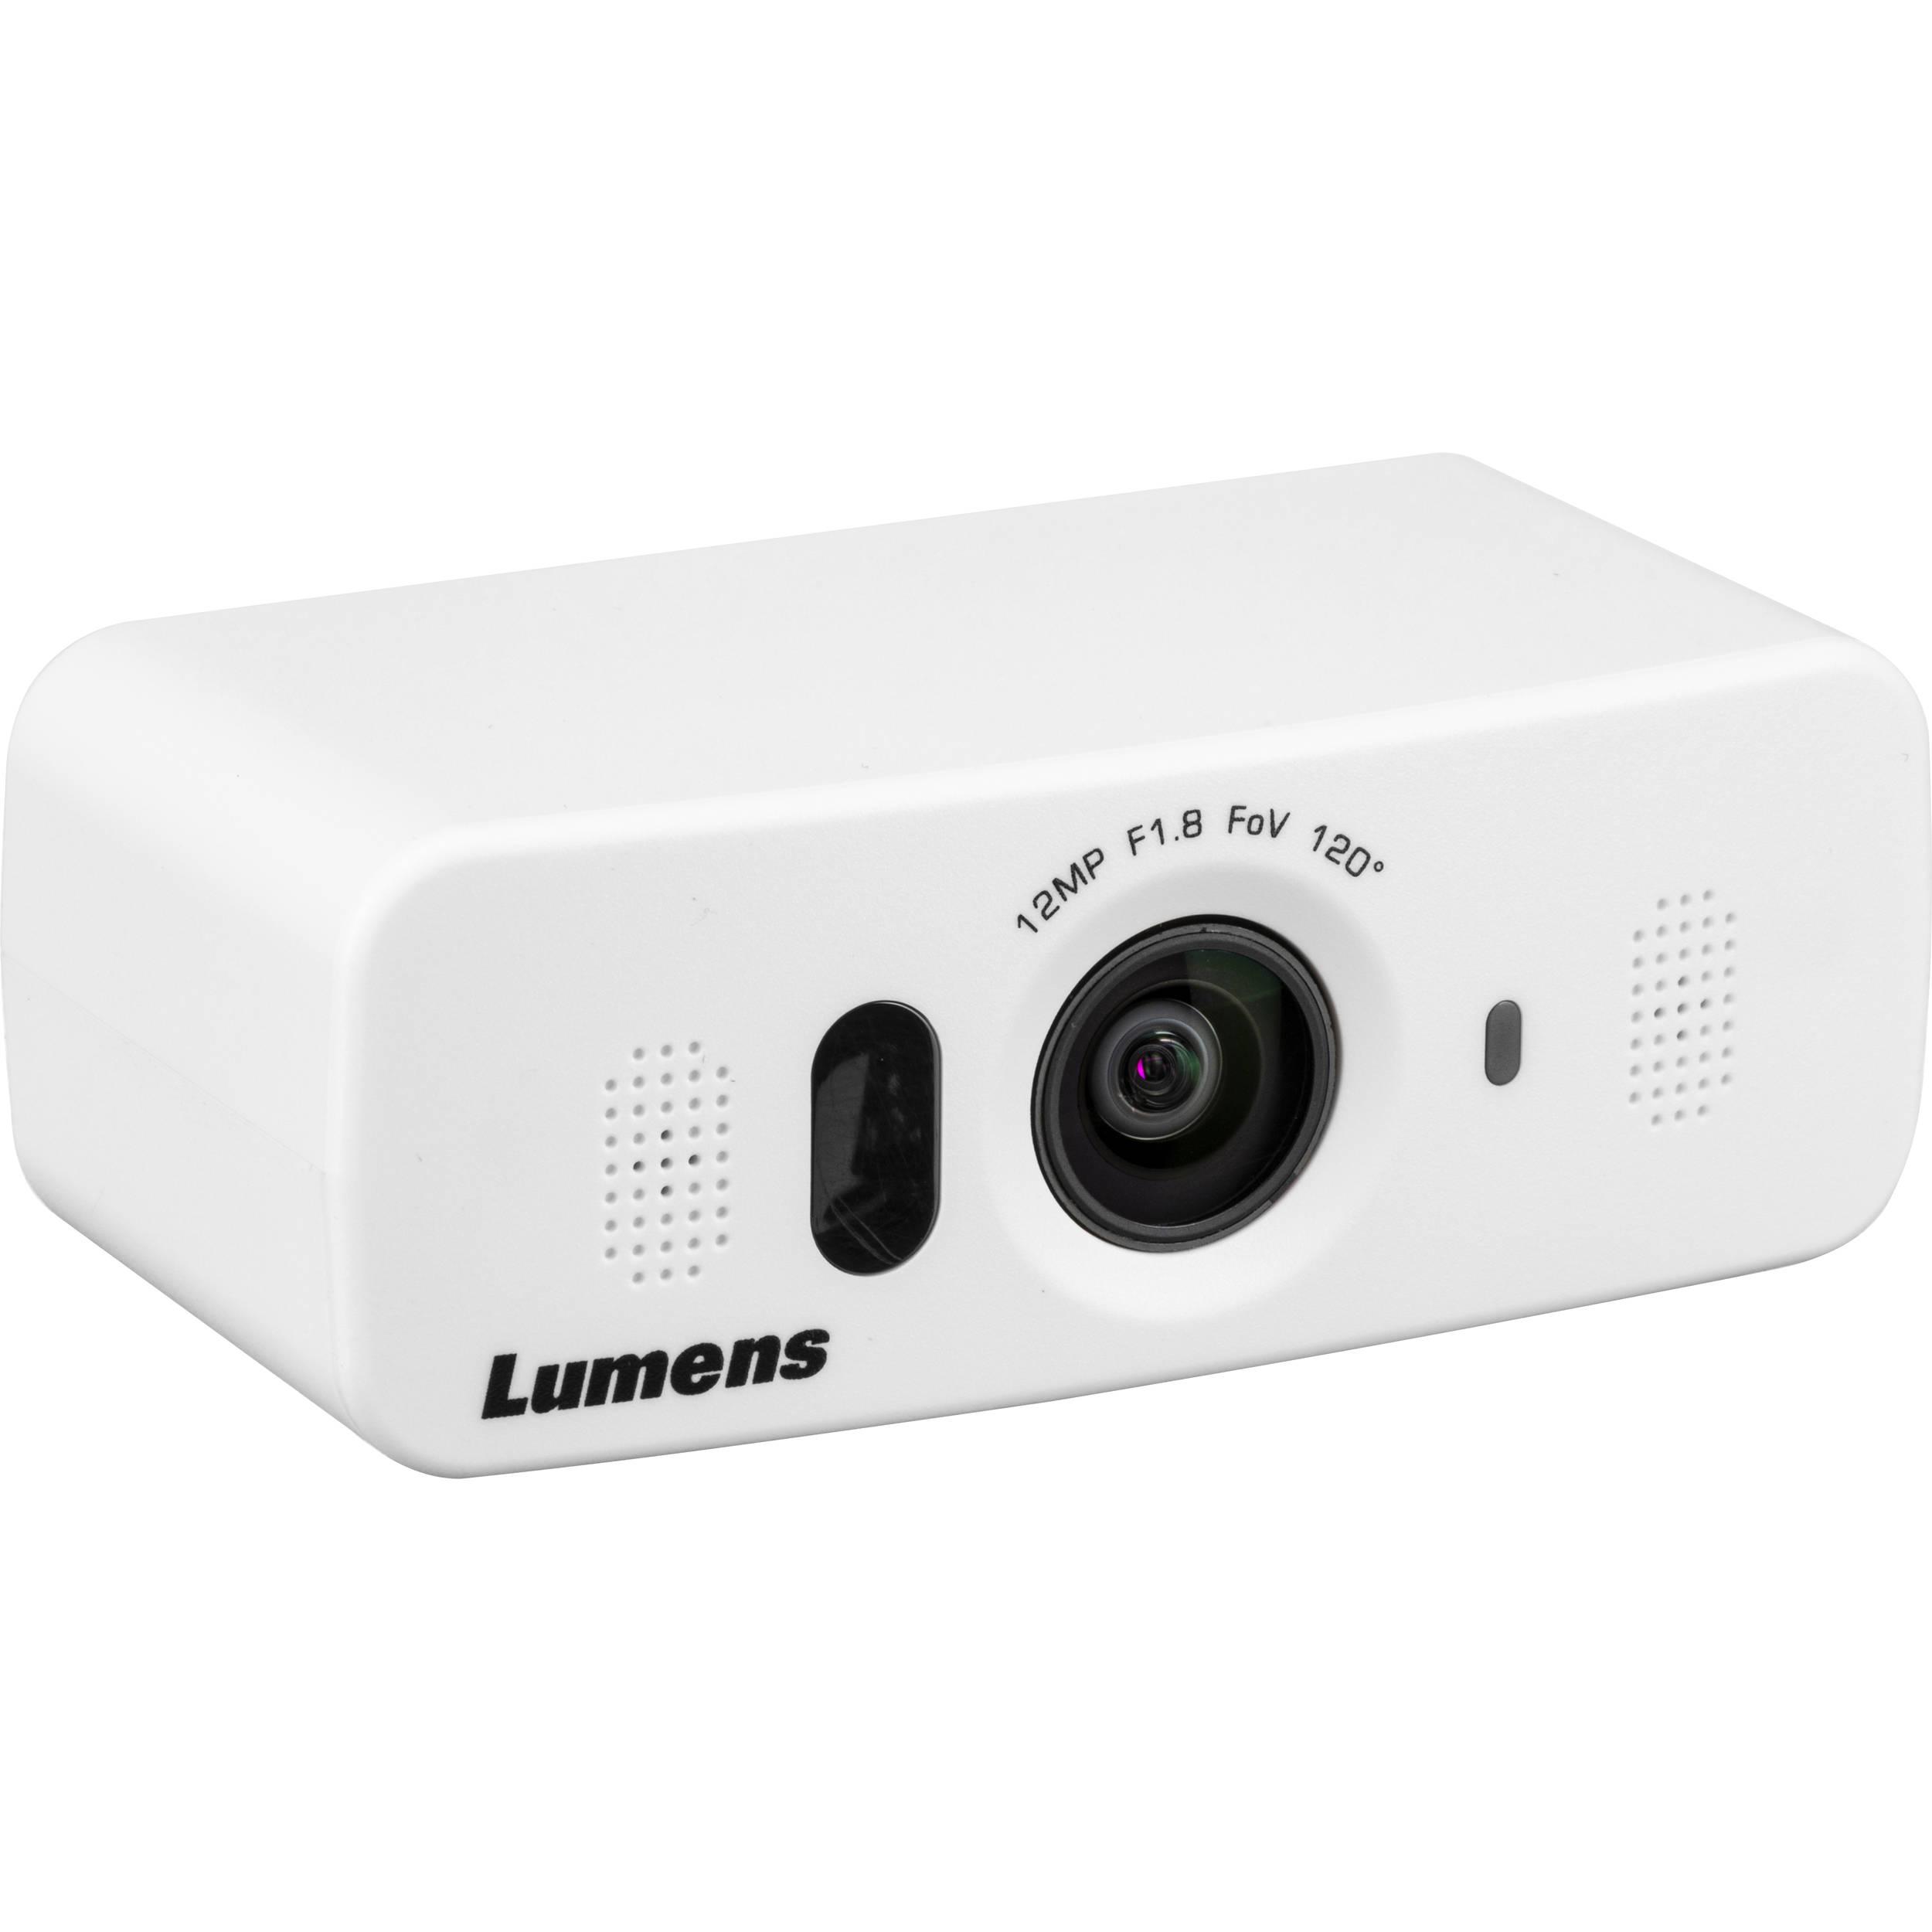 Lumens VC-B10U ePTZ Camera, USB 3 0 (Black)